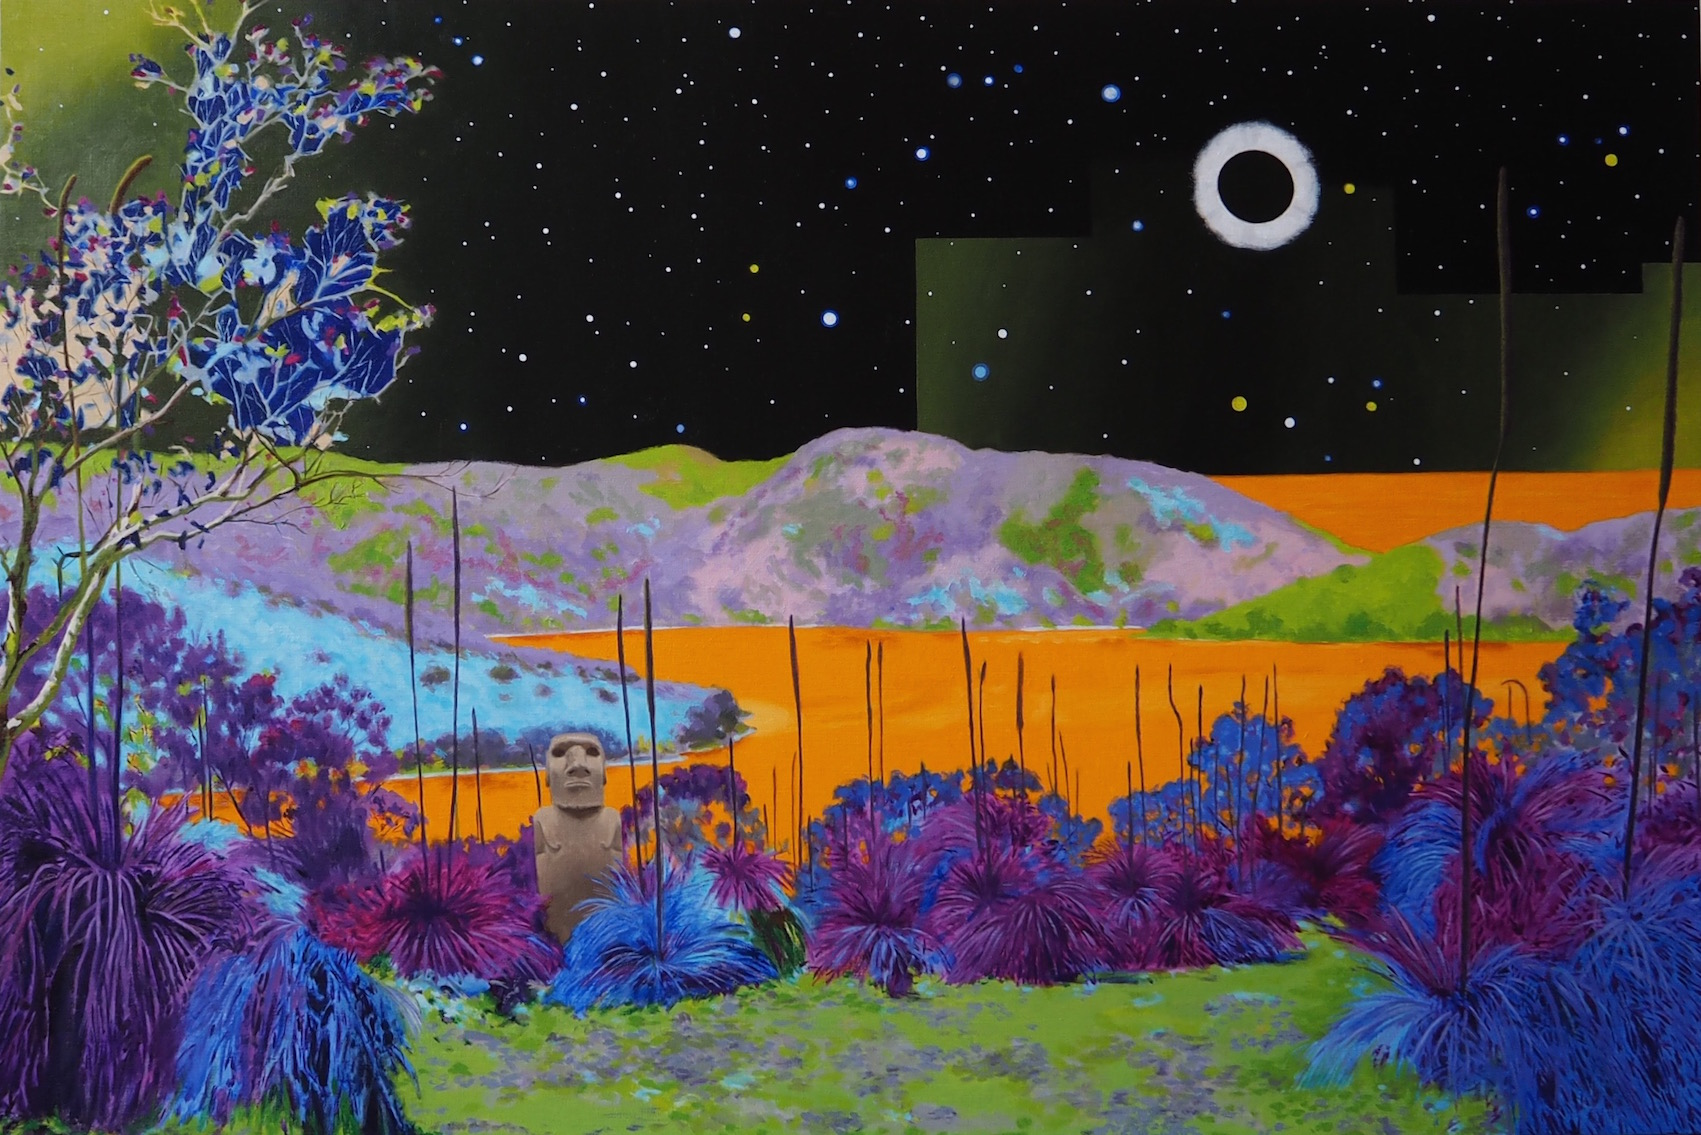 Richard Knafelc  Eclipse  2016 oil on linen 122 x 183 cm     Finalist in the John Leslie Art Prize 2016   John Leslie Art Prize - for landscape painting.  Gippsland Art Gallery, Sale, Victoria.  Saturday 3 September to Sunday 20 November 2016.